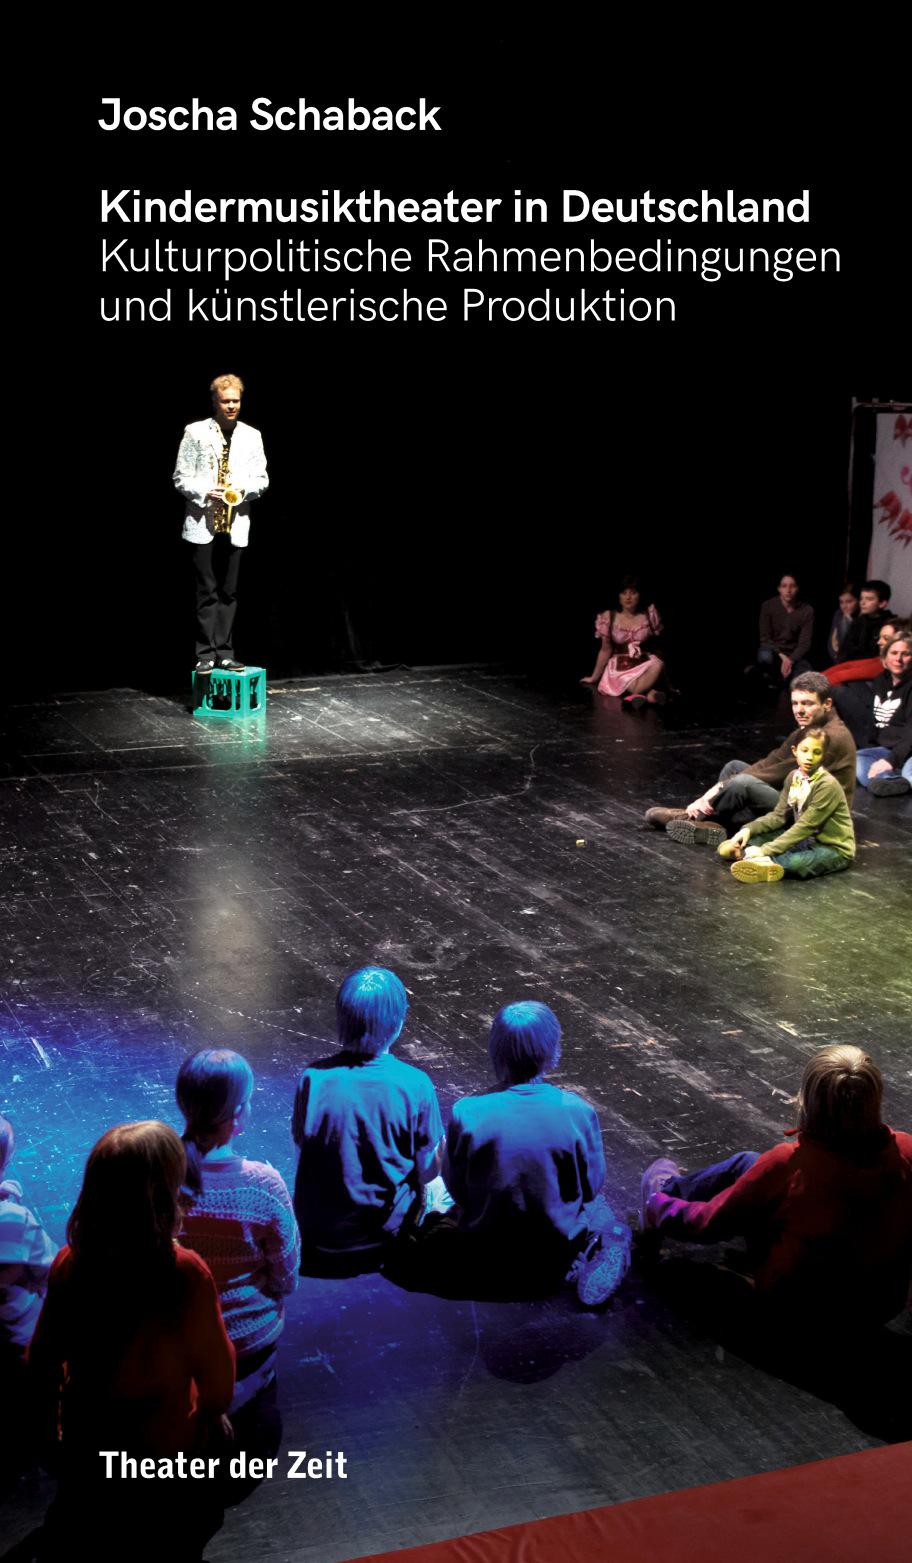 Joscha Schaback: Kindermusiktheater in Deutschland